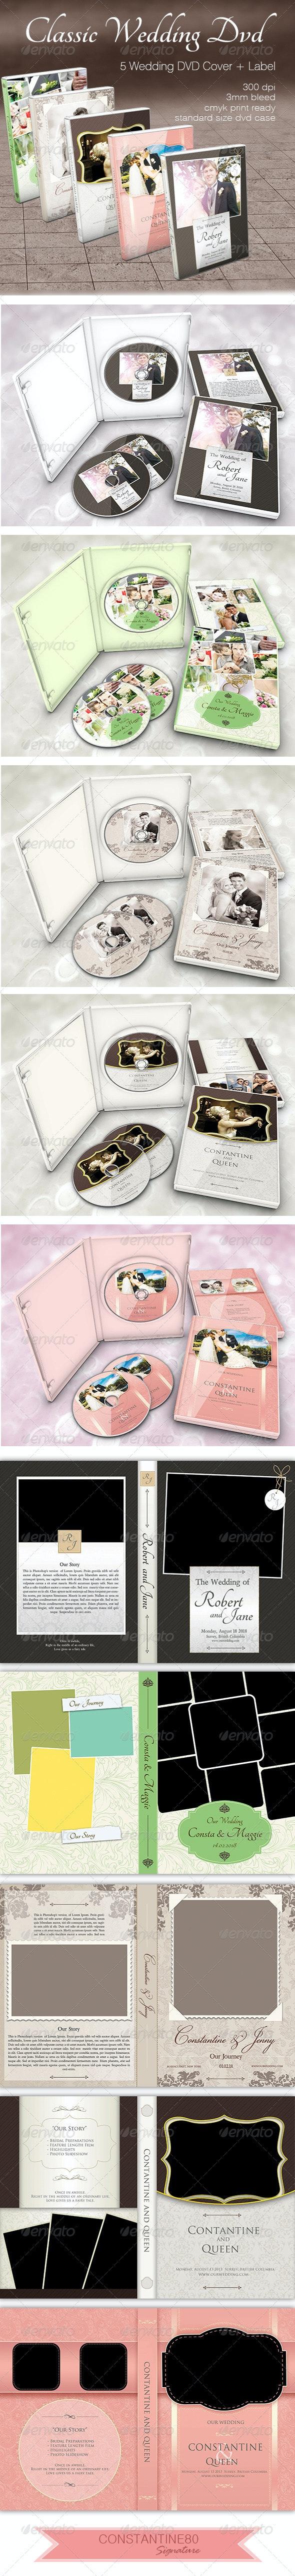 Classic Wedding Dvd - CD & DVD Artwork Print Templates